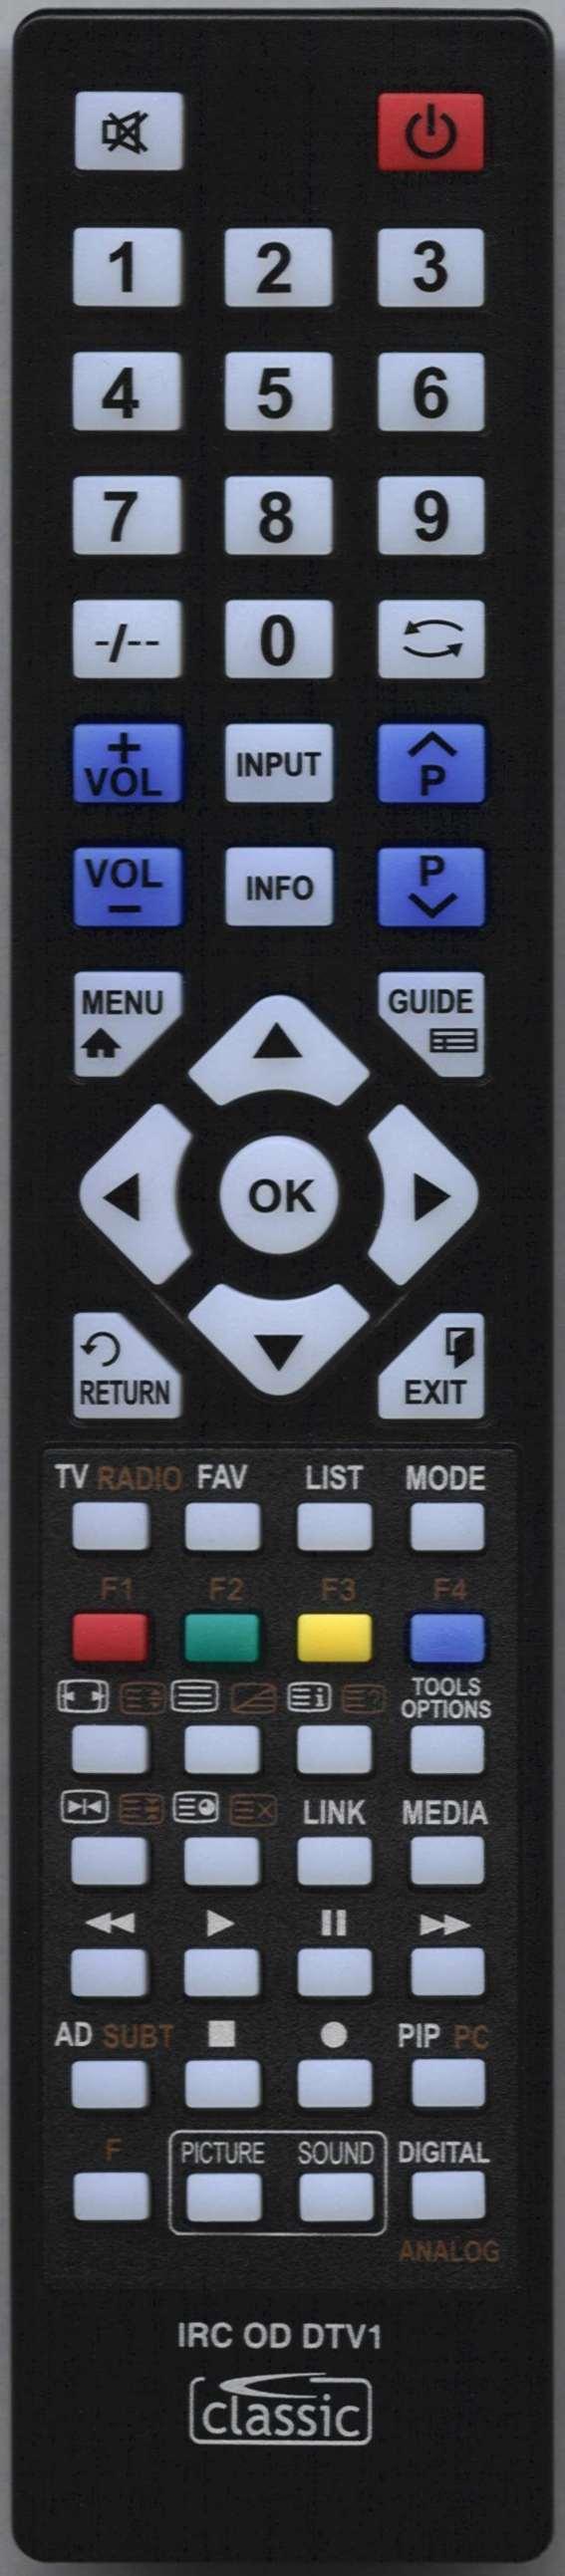 Baird TI22LED Remote Control